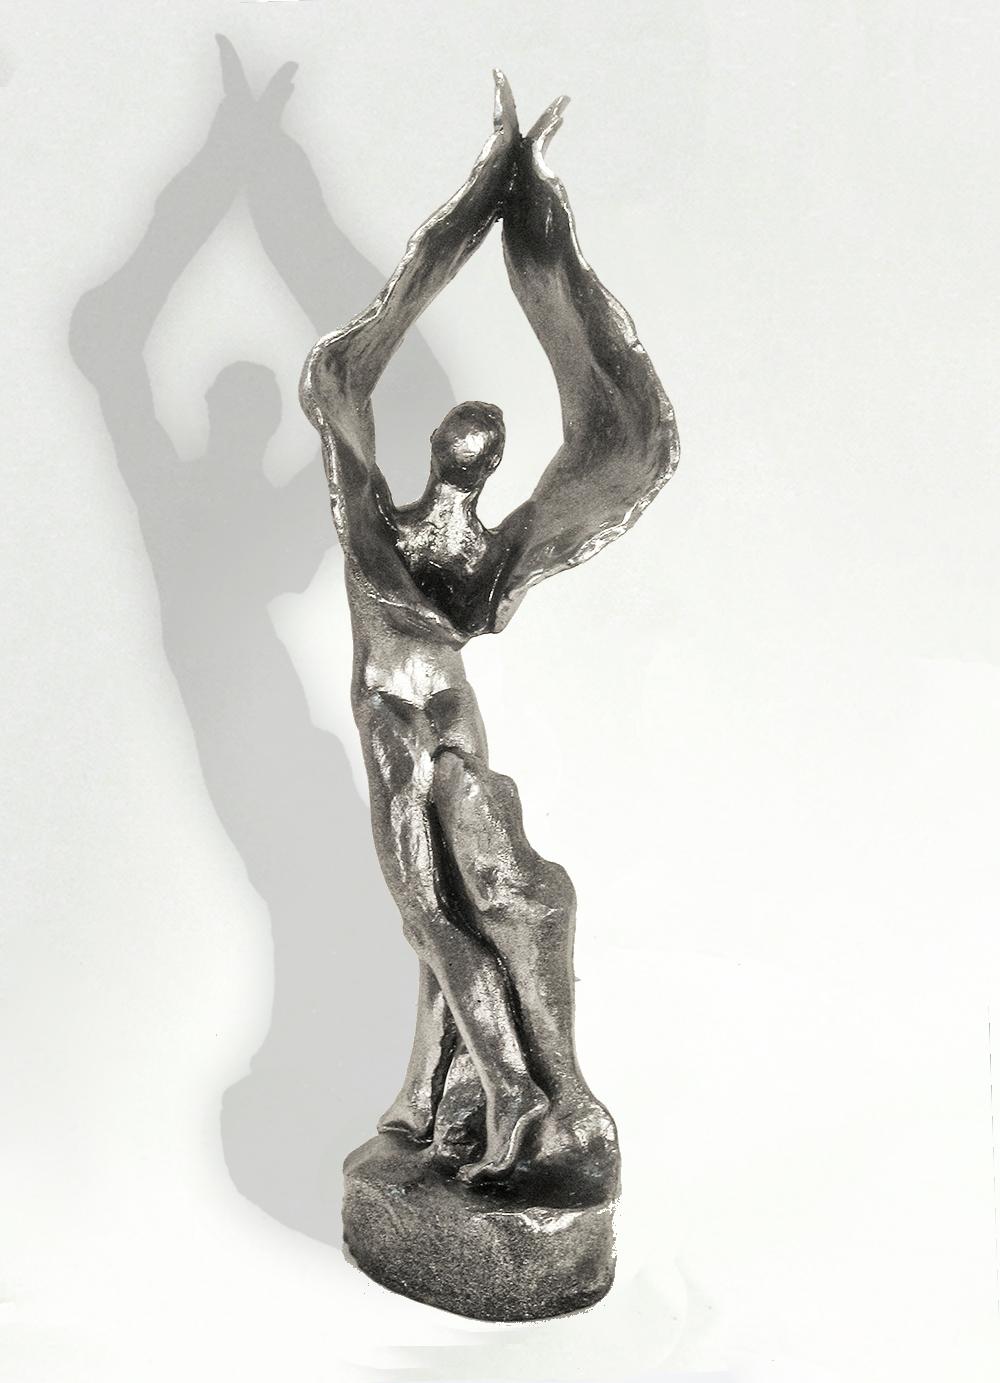 Escultura-Arcangel-D-Figurativo-Realista-RD.Escultor